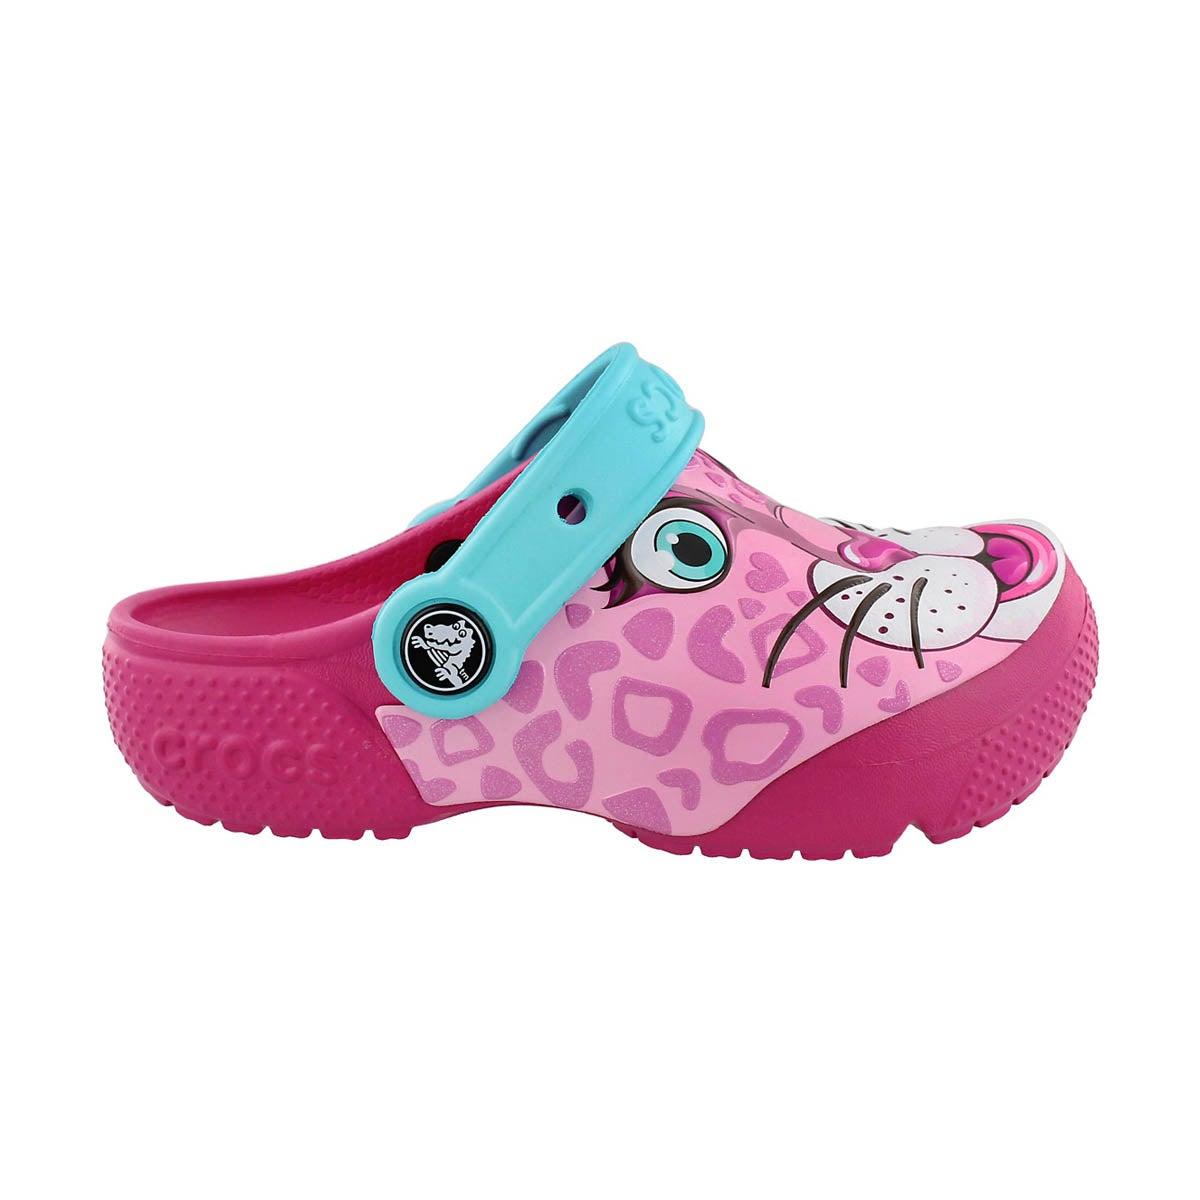 Grls Leopard Pink Funlab Clog